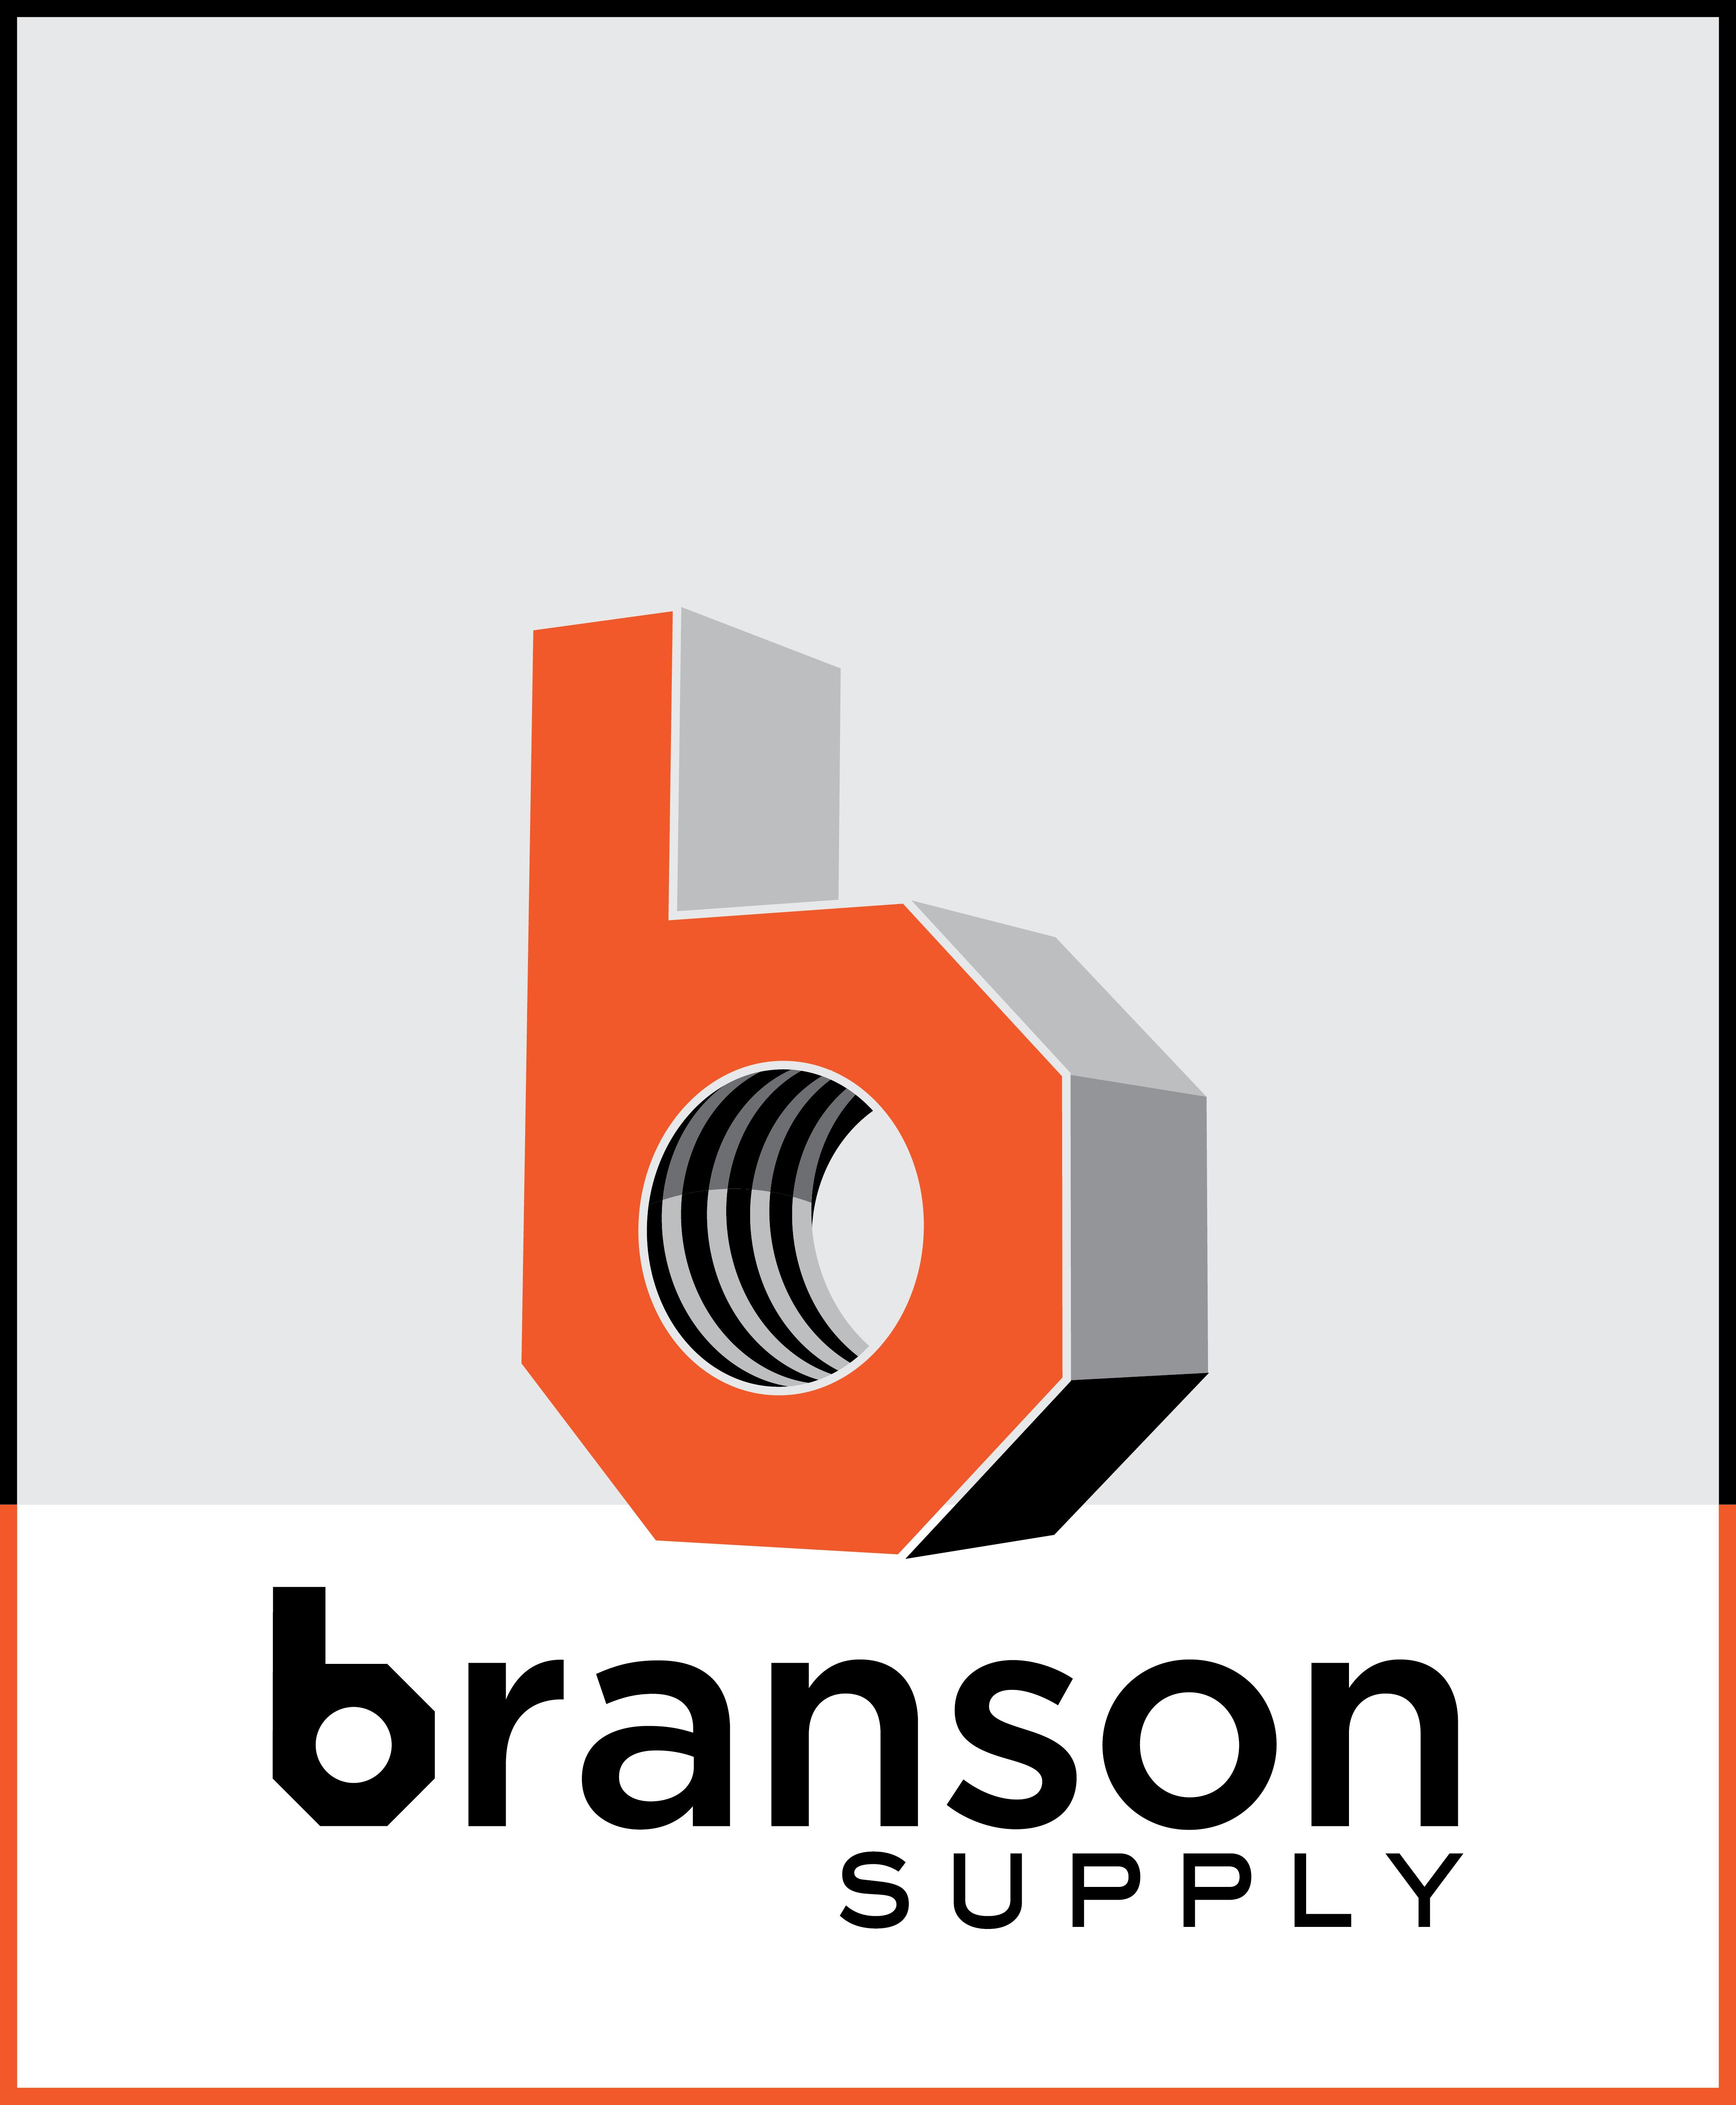 branson supply